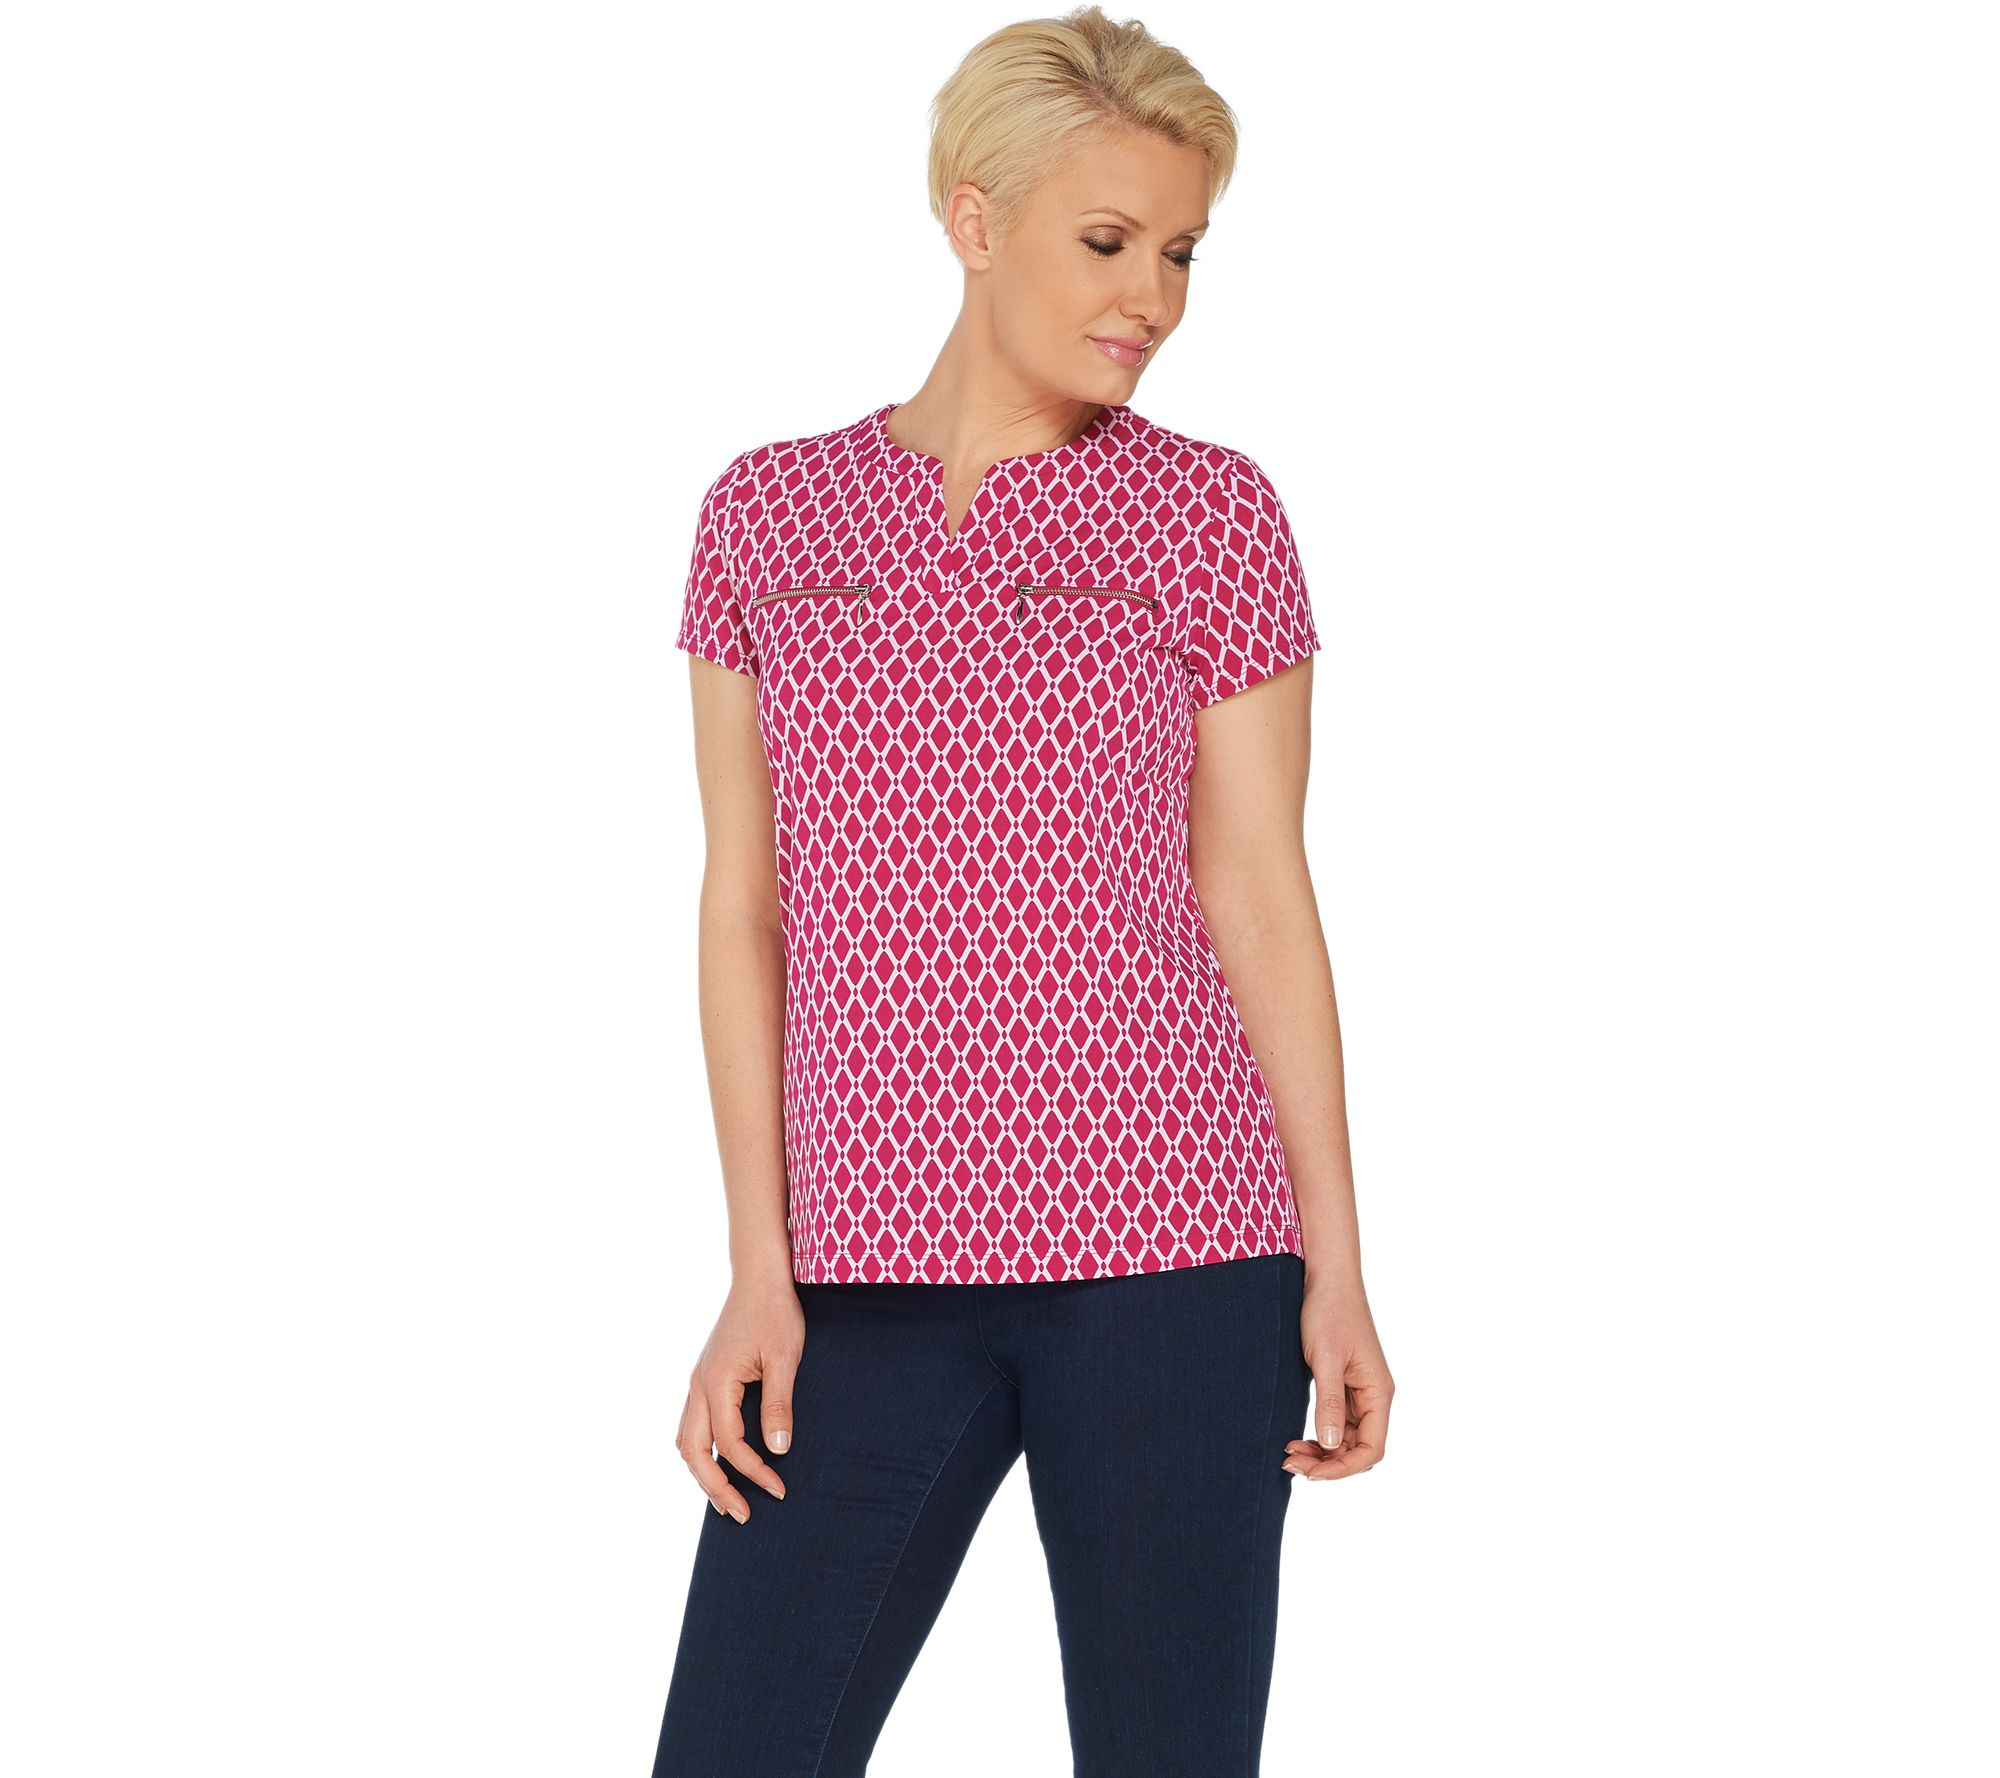 377870bff82 Susan Graver Printed Liquid Knit Top with Zipper Pockets - Page 1 — QVC.com